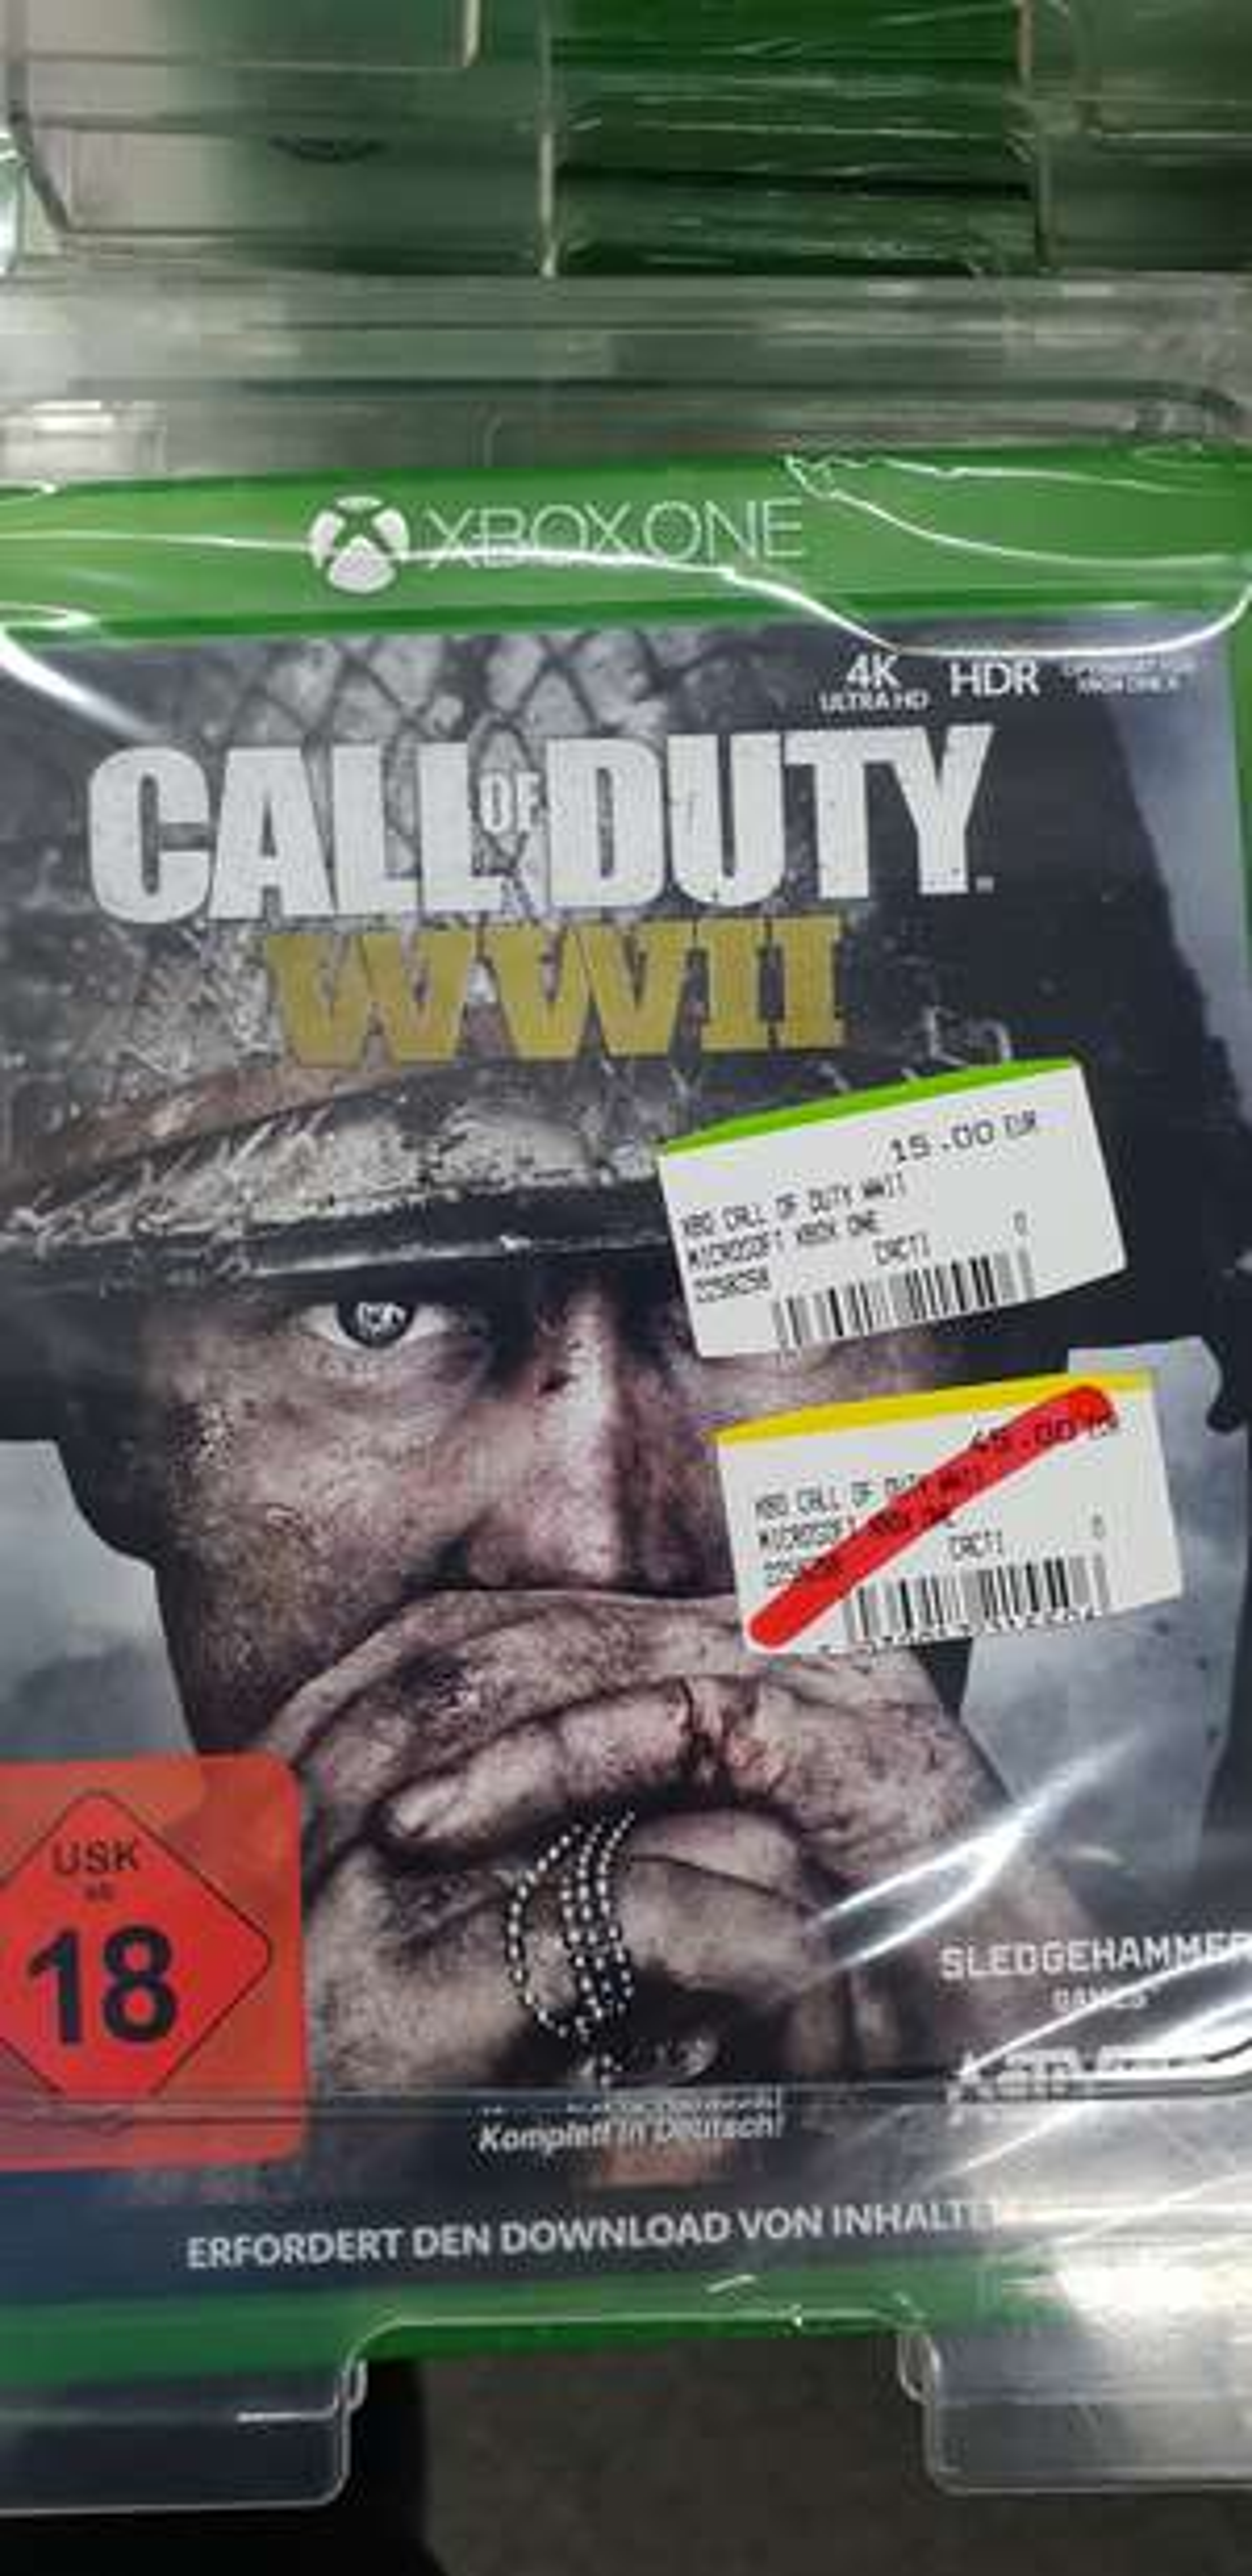 [Media Markt Berlin Schöneweide] XBox One - Call of Duty  WWII